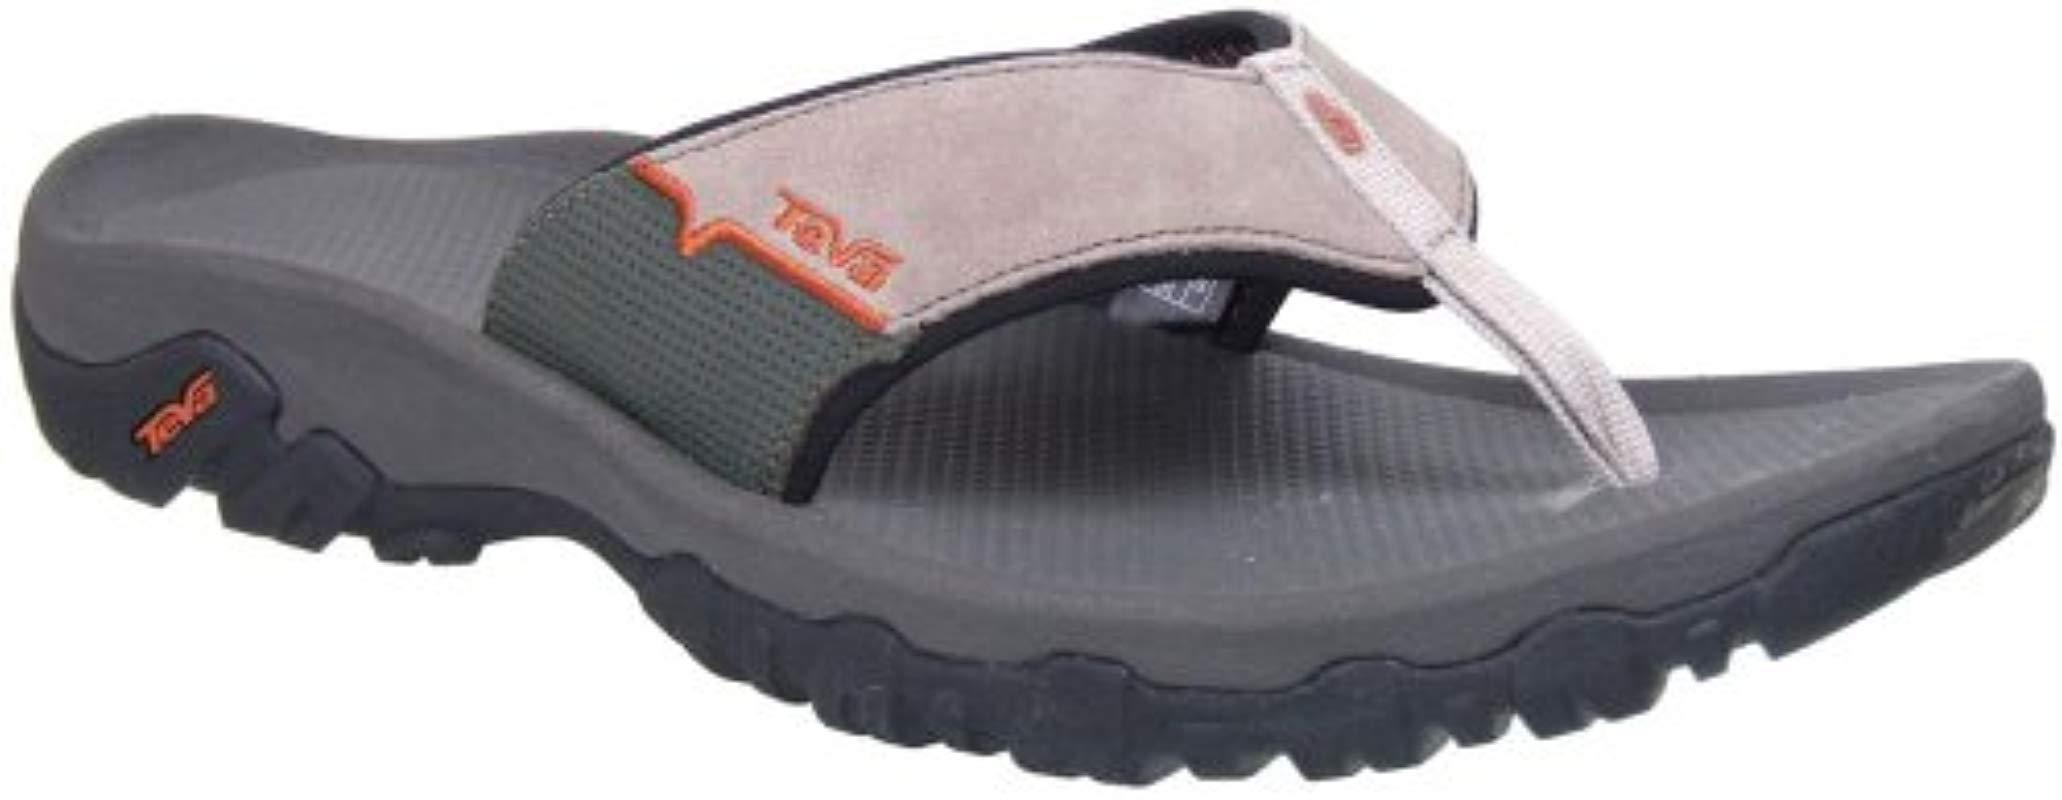 f0cc5bd8fcc9 Lyst - Teva Katavi Thong Outdoor Sandal